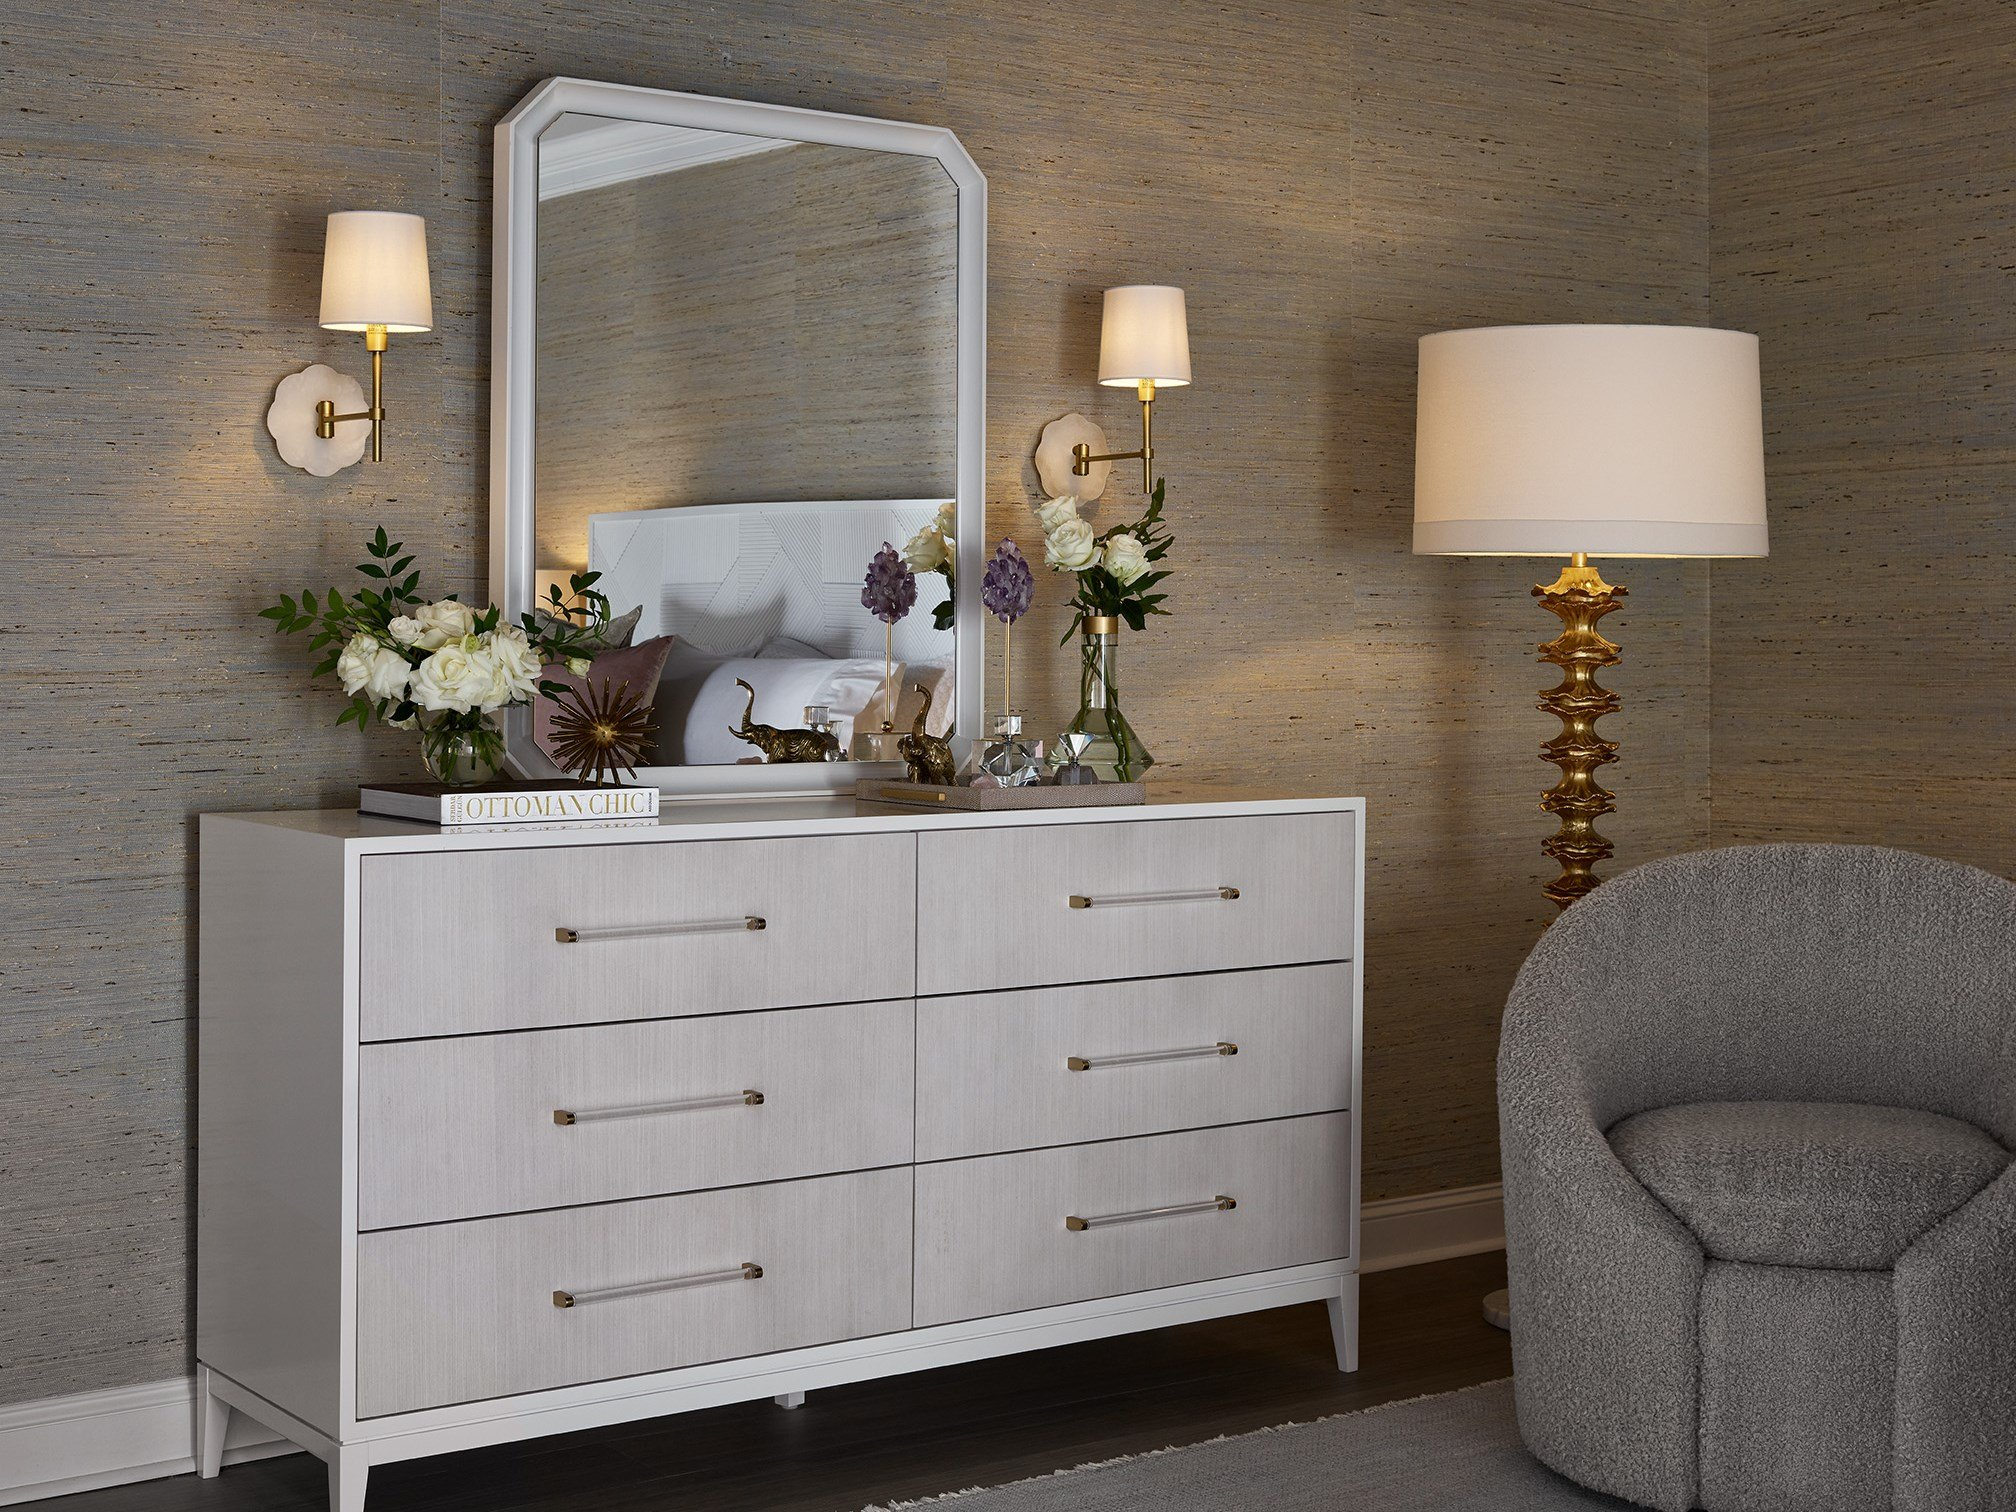 Brentwood Dresser